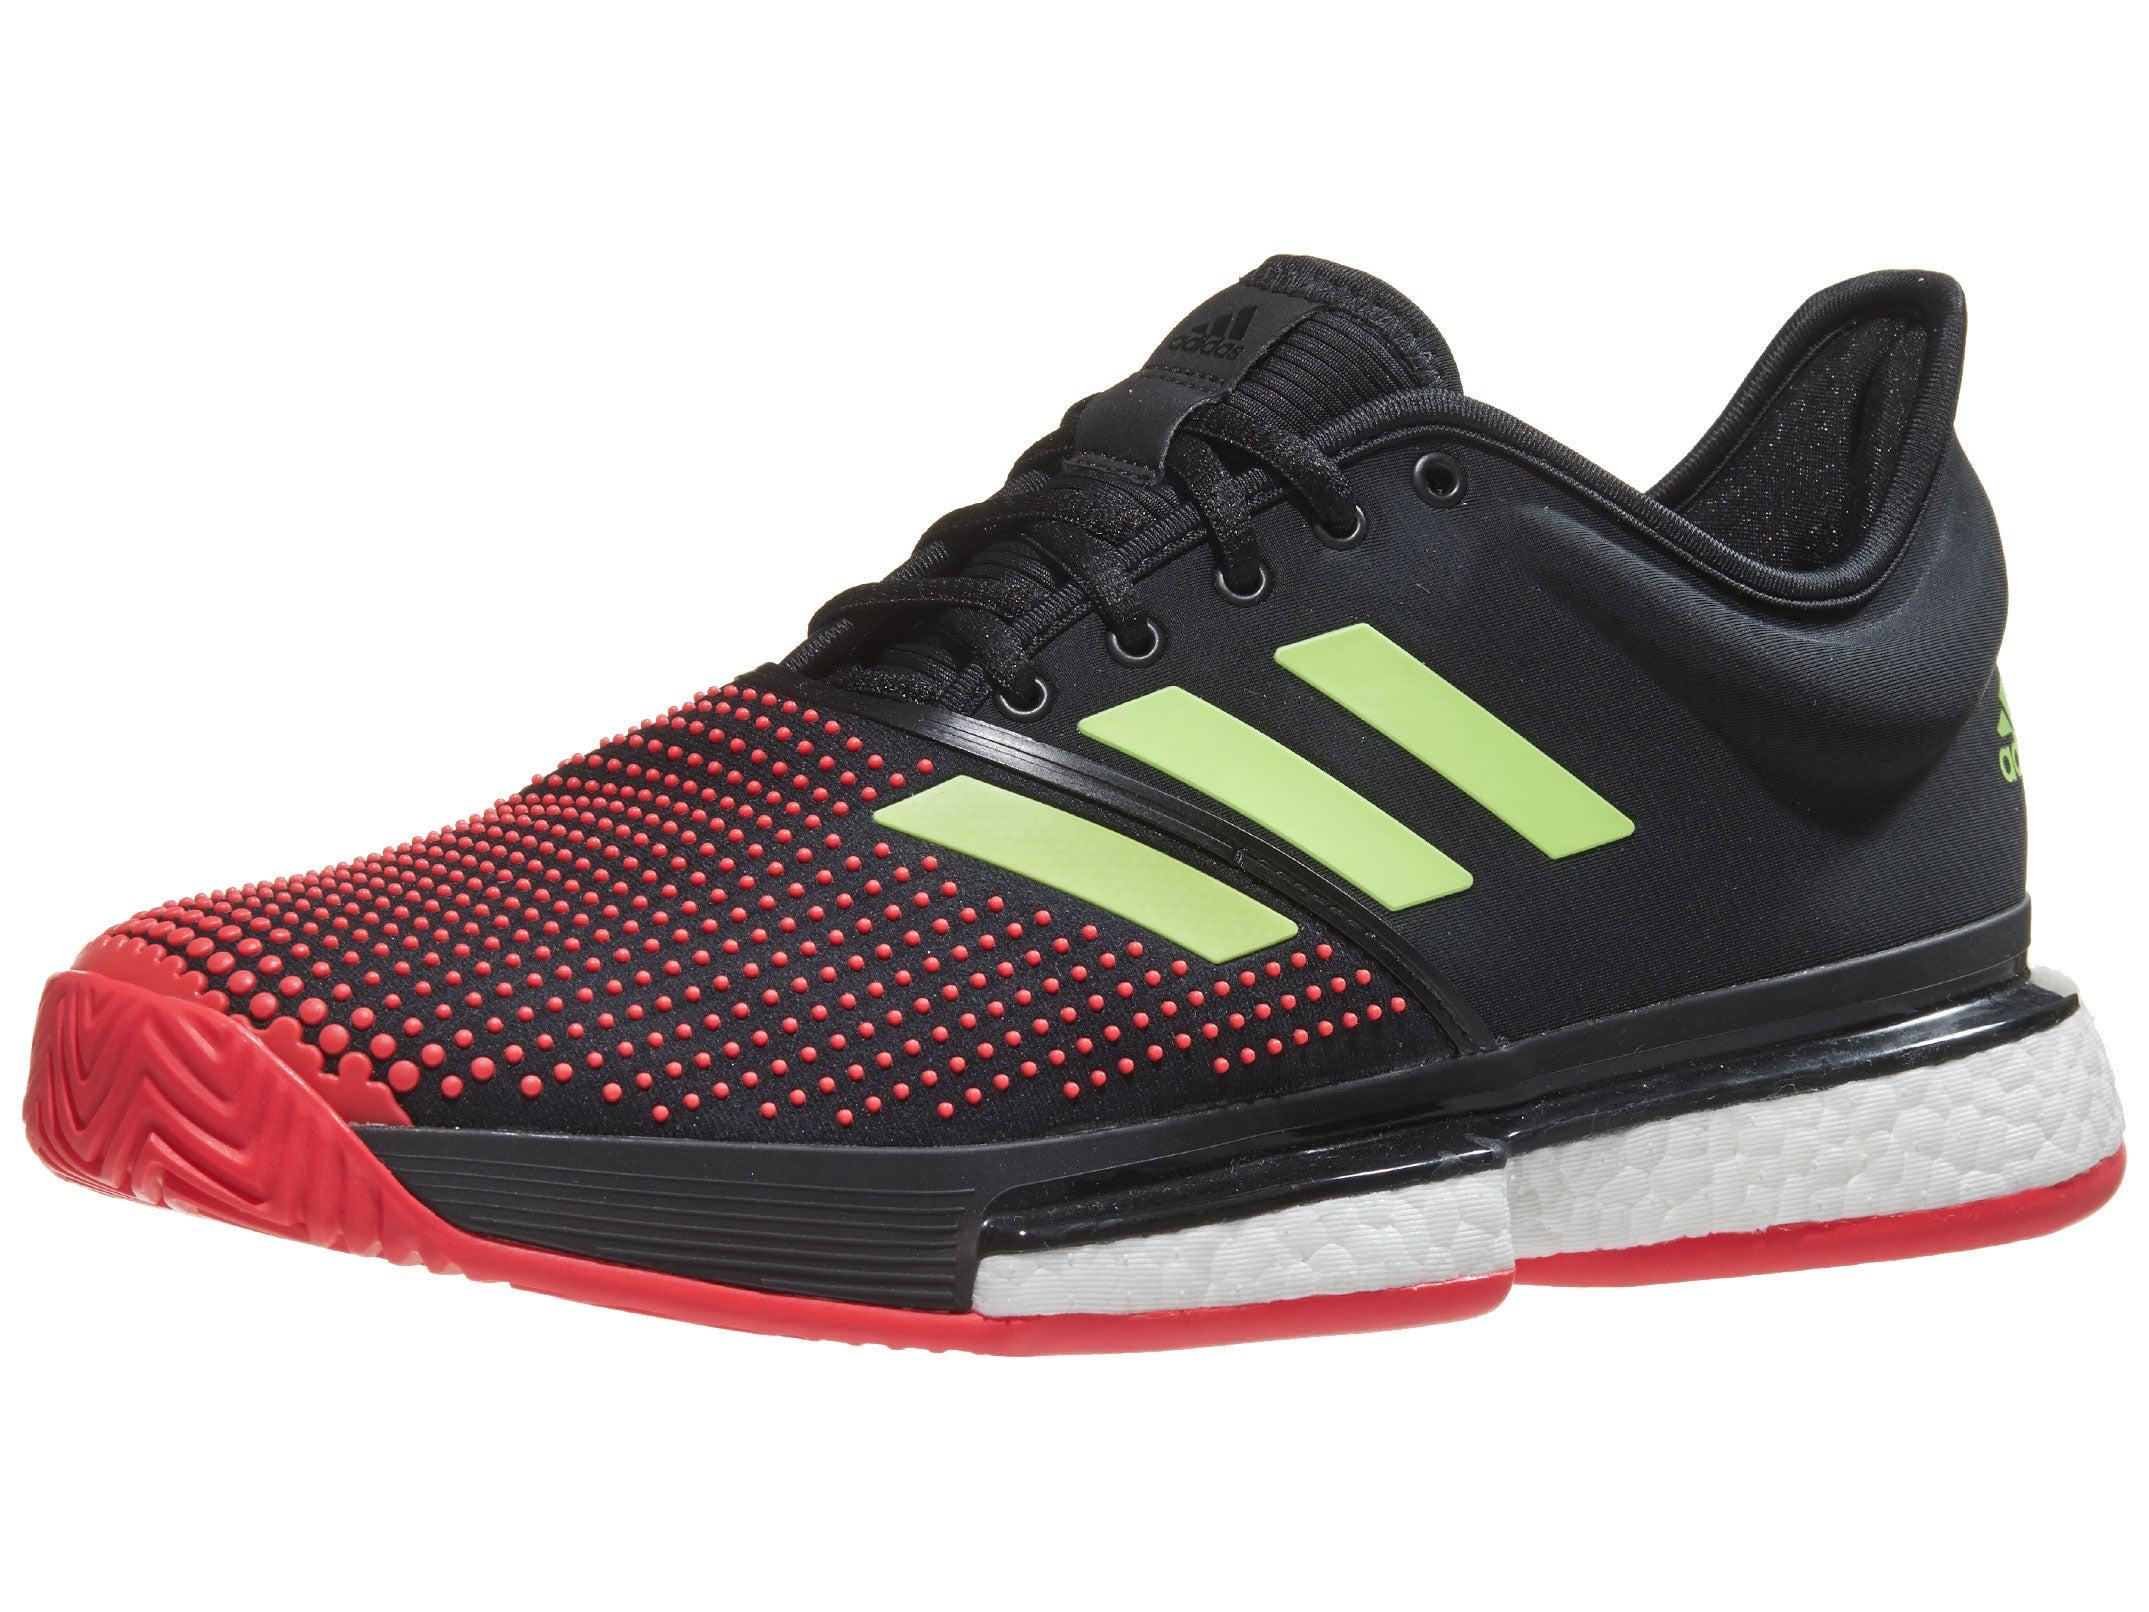 Adidas Solecourt Boost Bk Red Green Men S Shoes